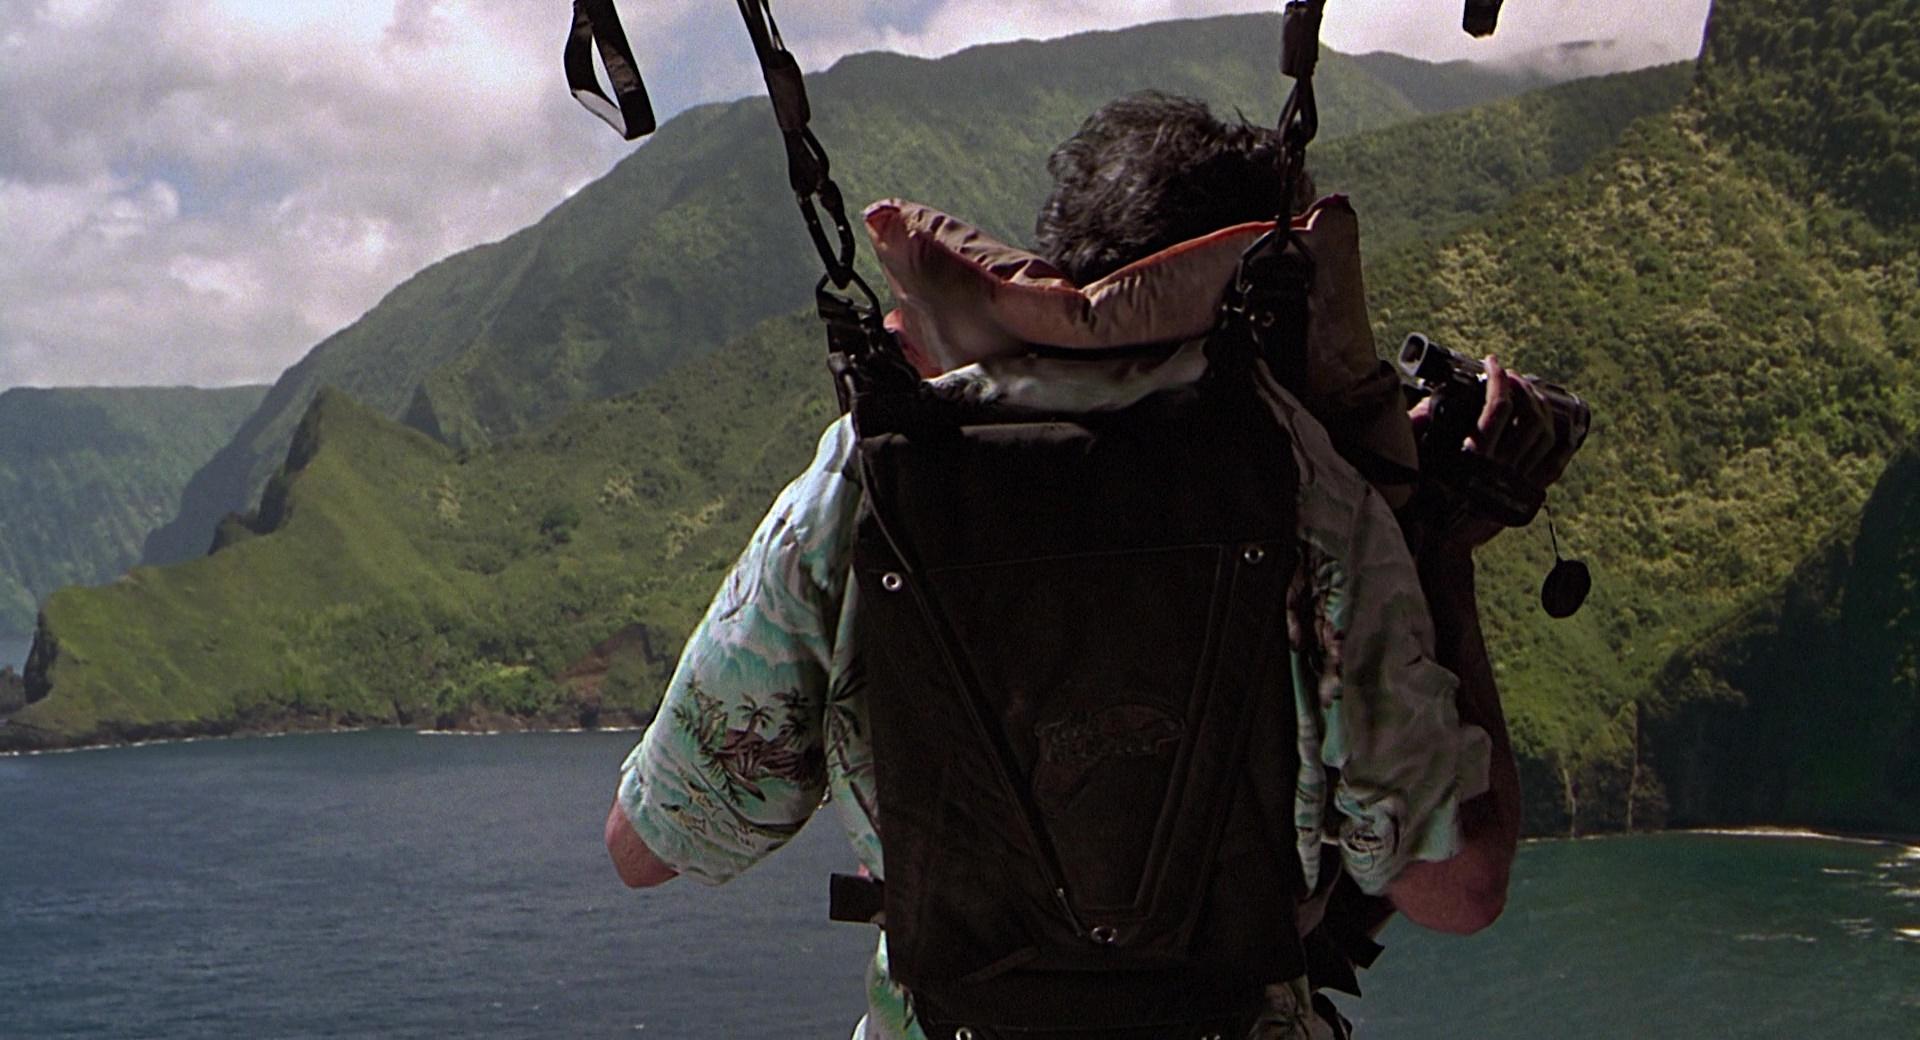 Panasonic Video Camera In Jurassic Park 3 2001 Movie